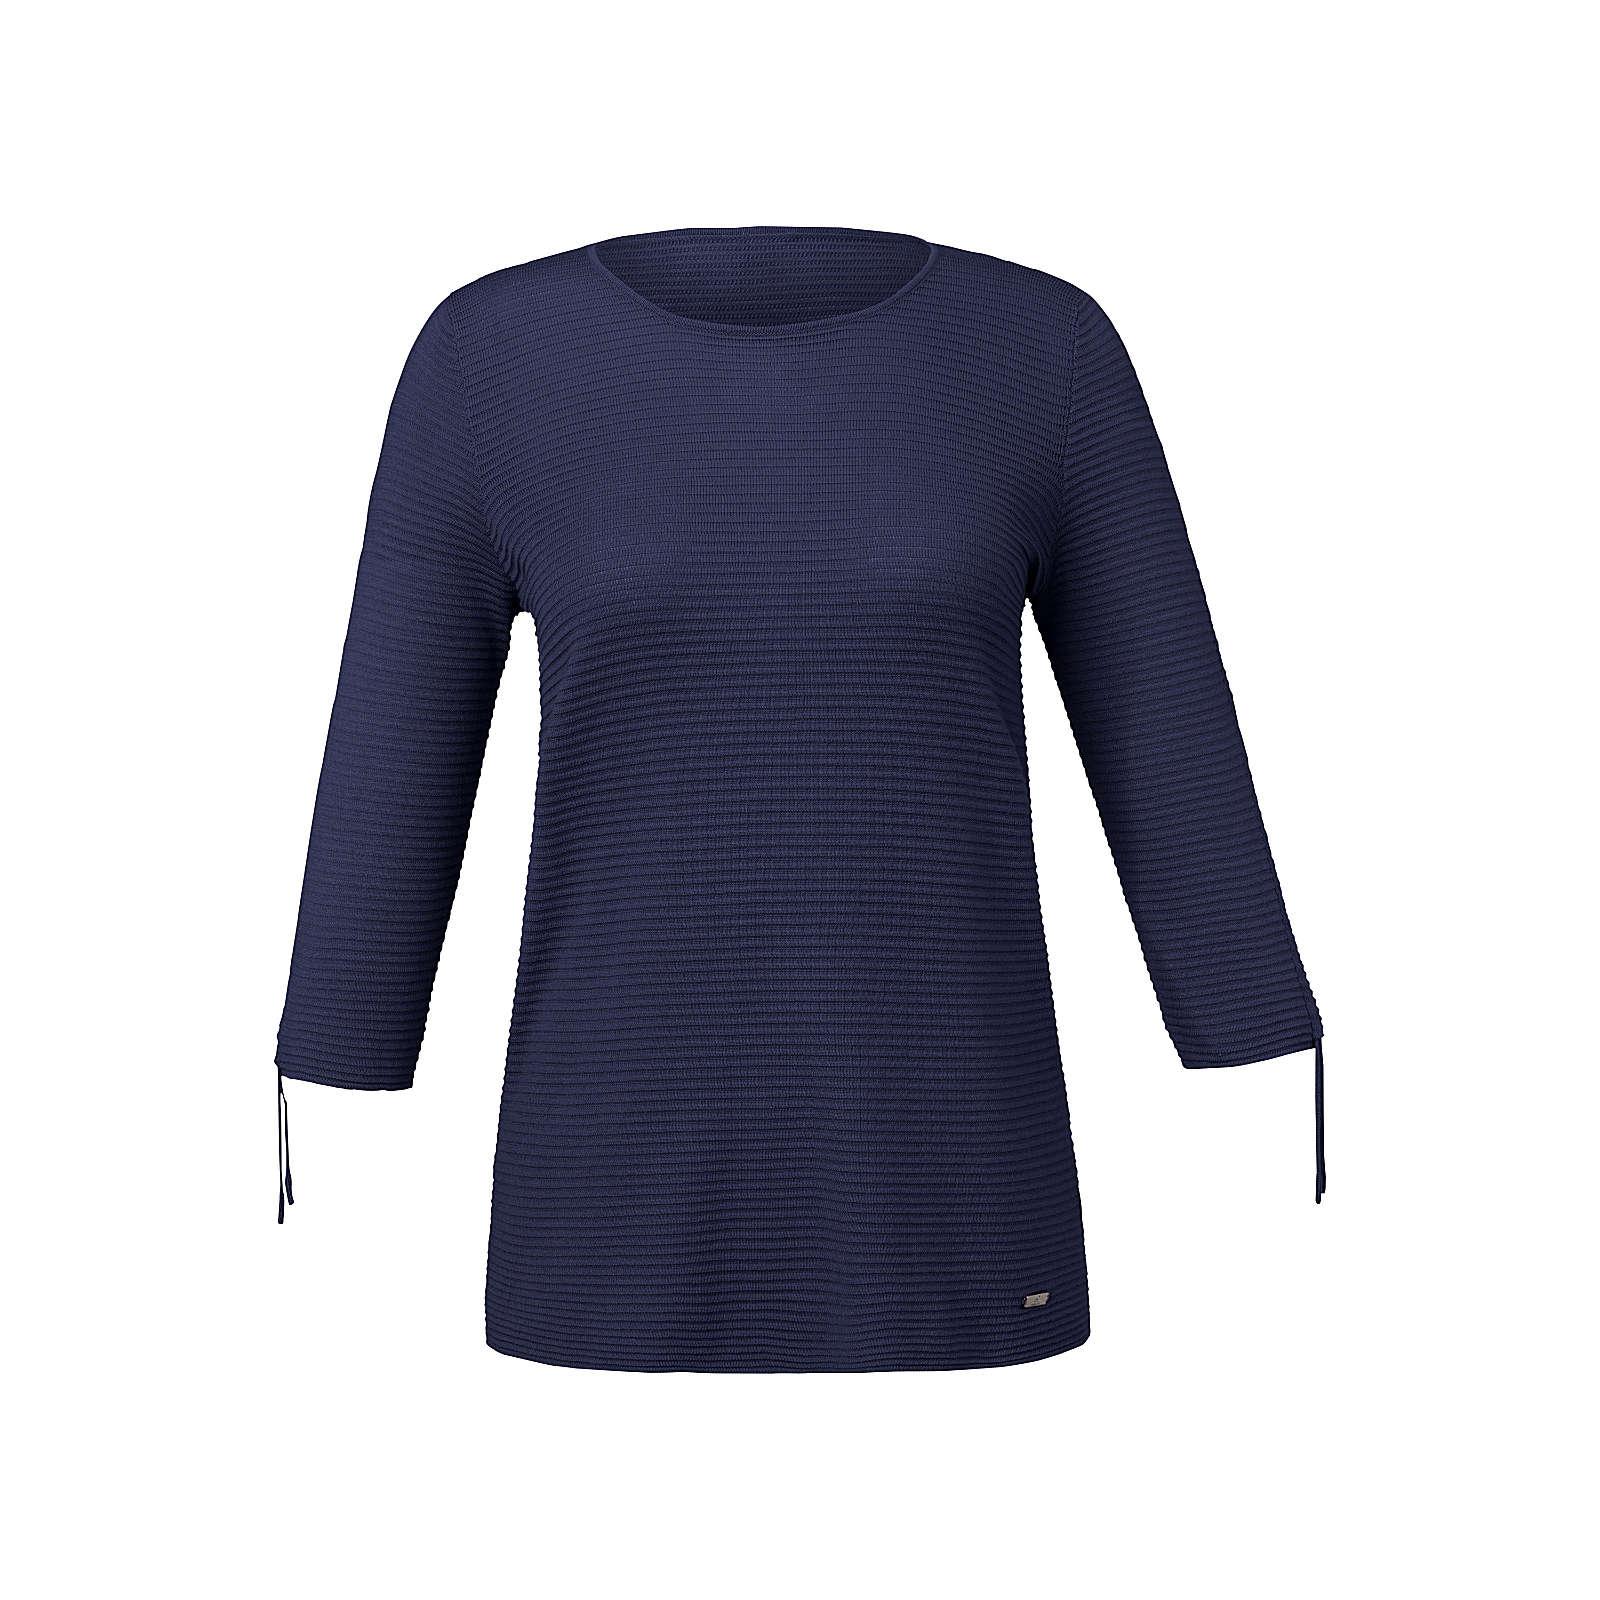 EMILIA LAY Pullover mit 3/4-Arm Pullover blau Damen Gr. 52